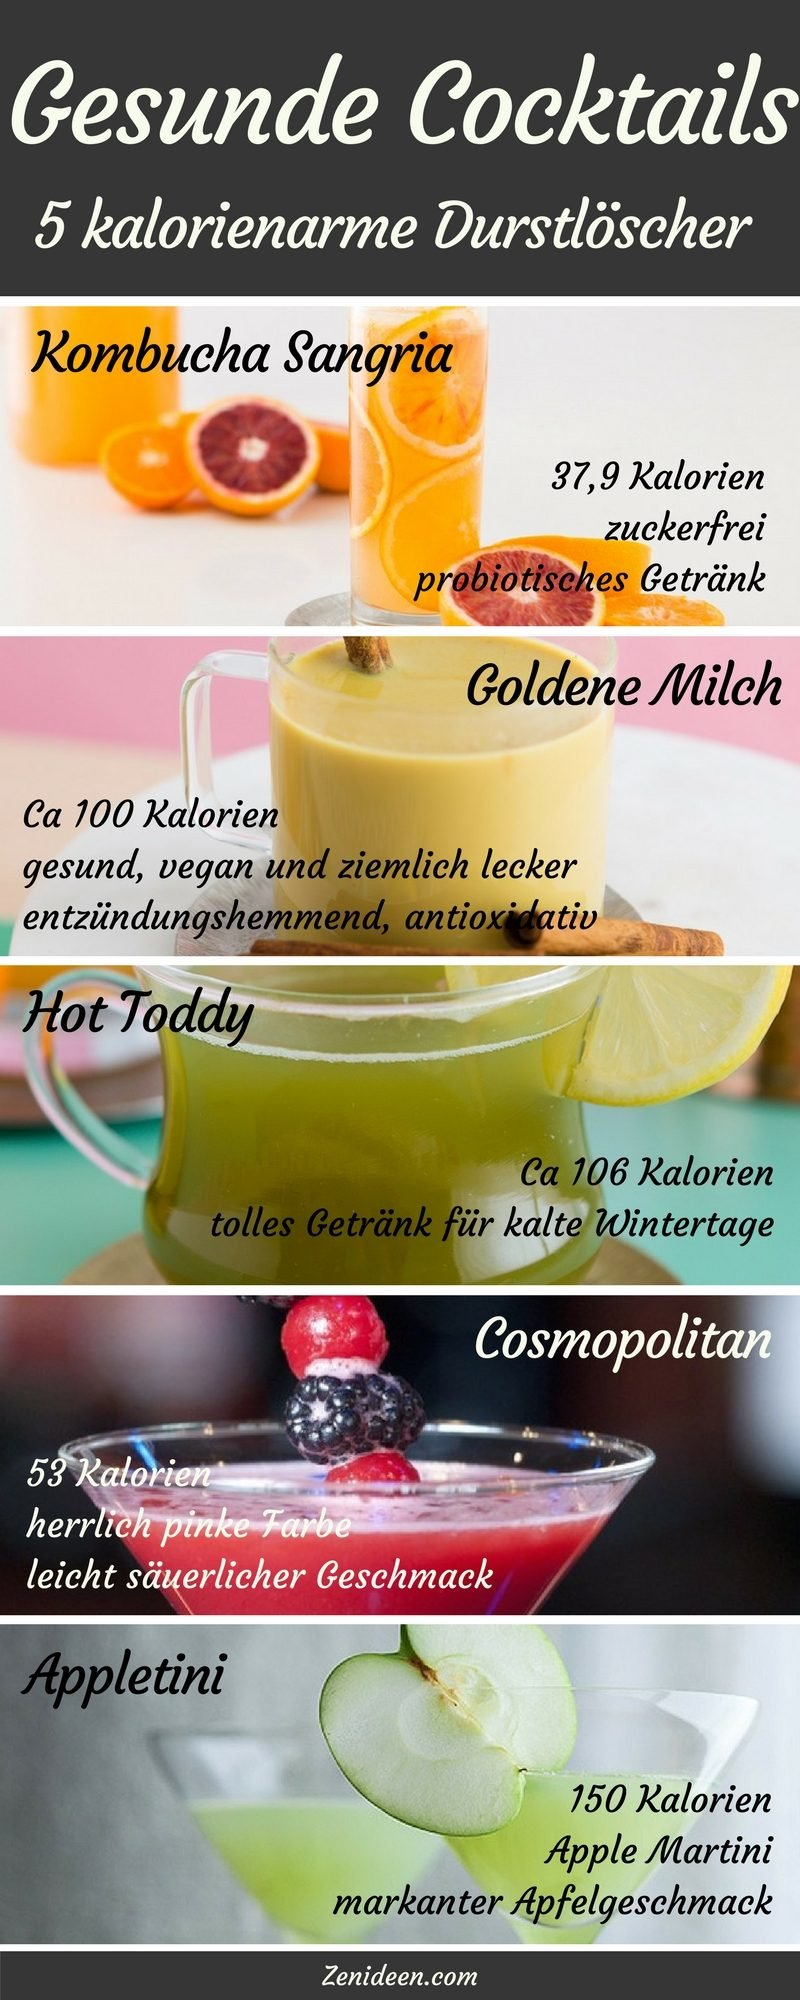 schnelle gesunde rezepte infografik gesunde cocktails kalorienarme getränke